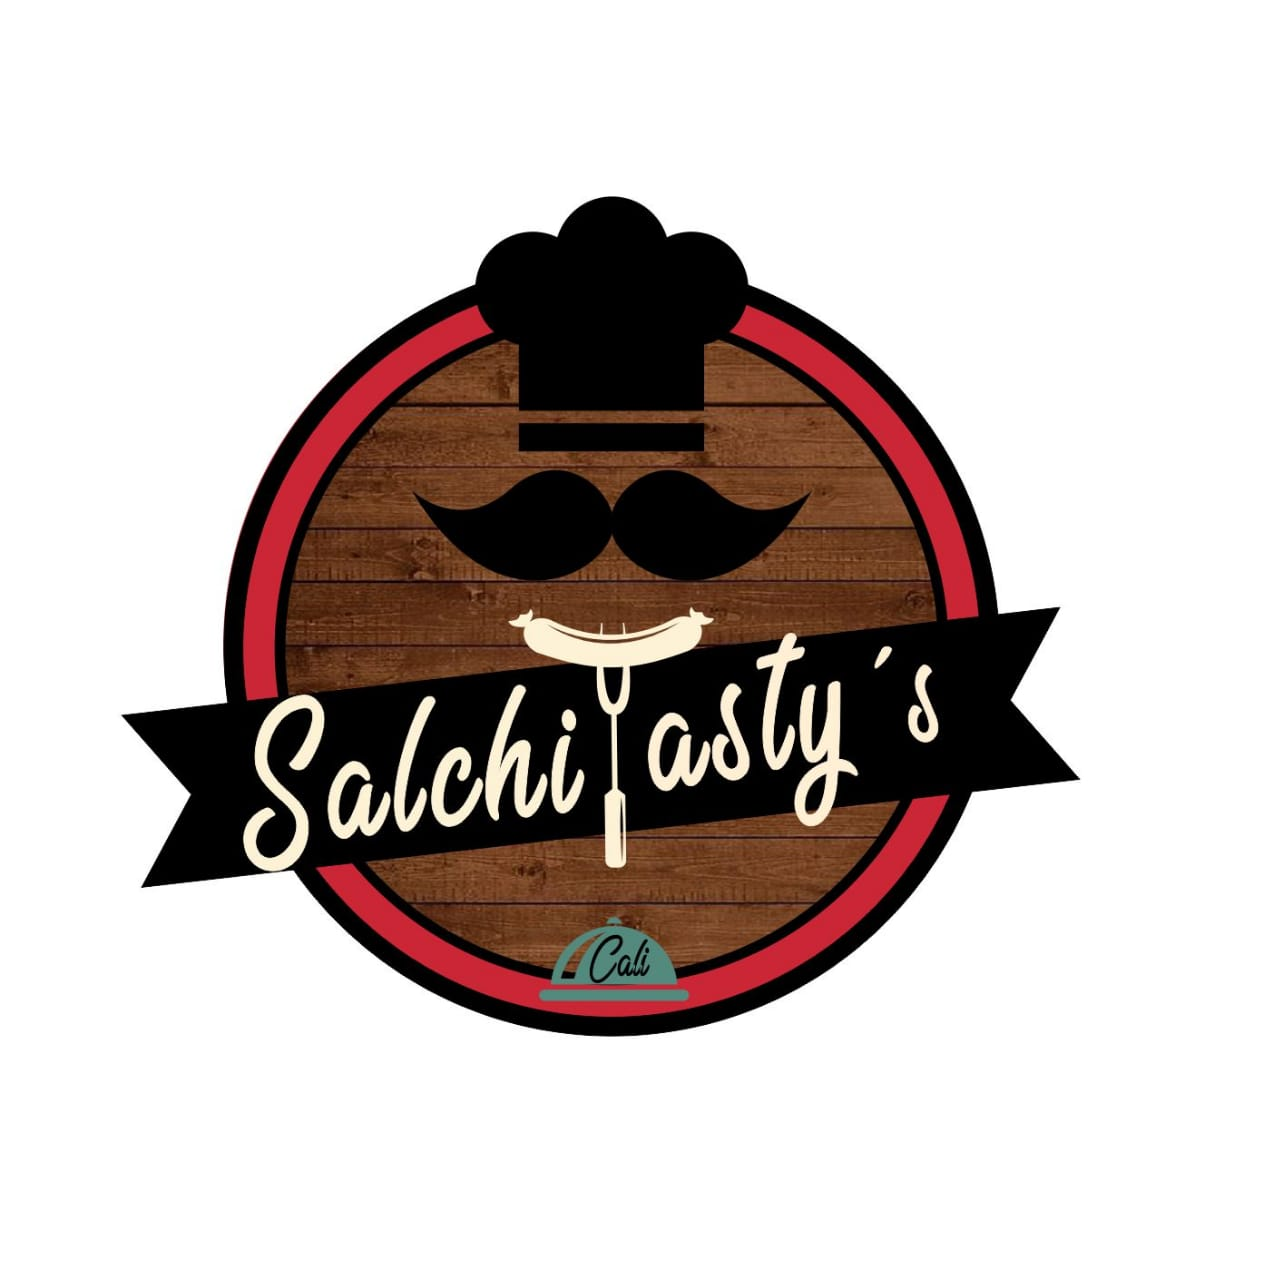 Salchi Tasty's